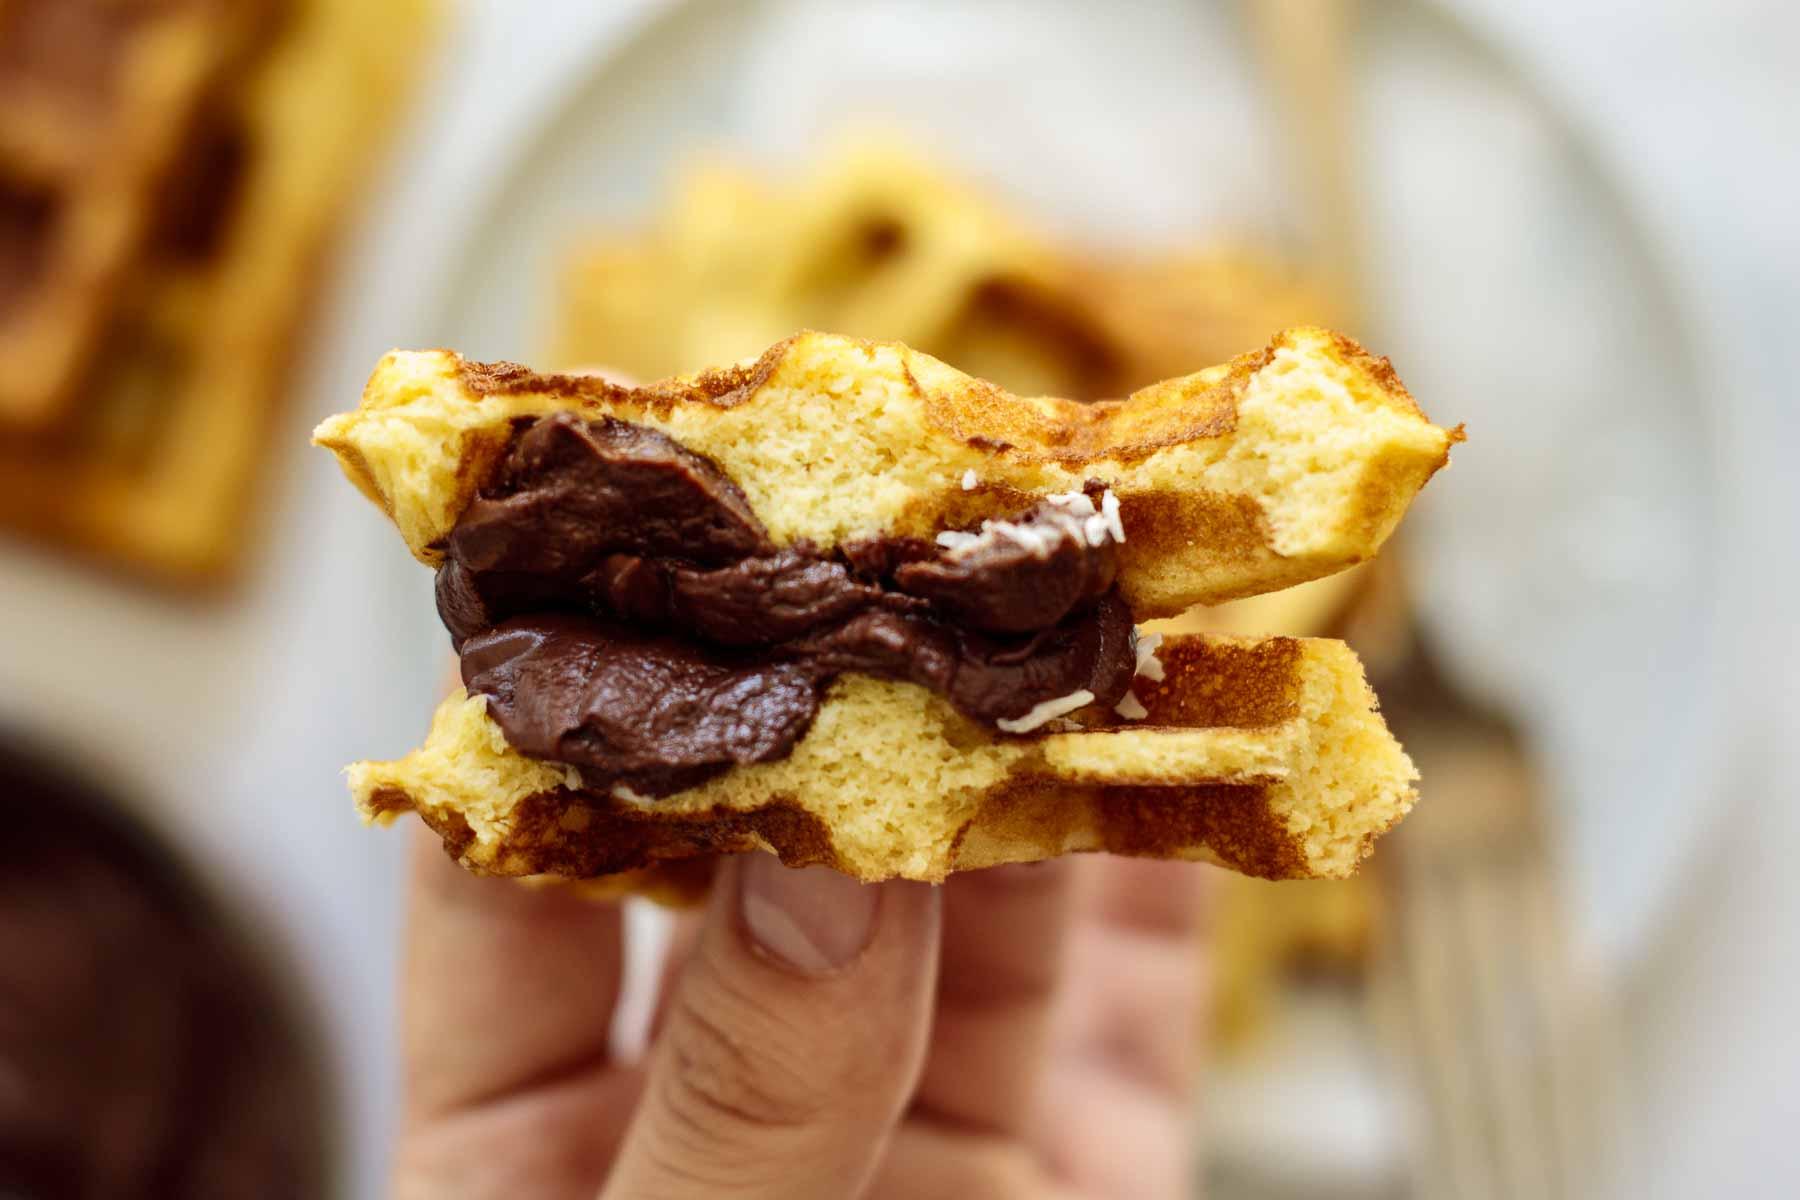 Inside waffle's texture.